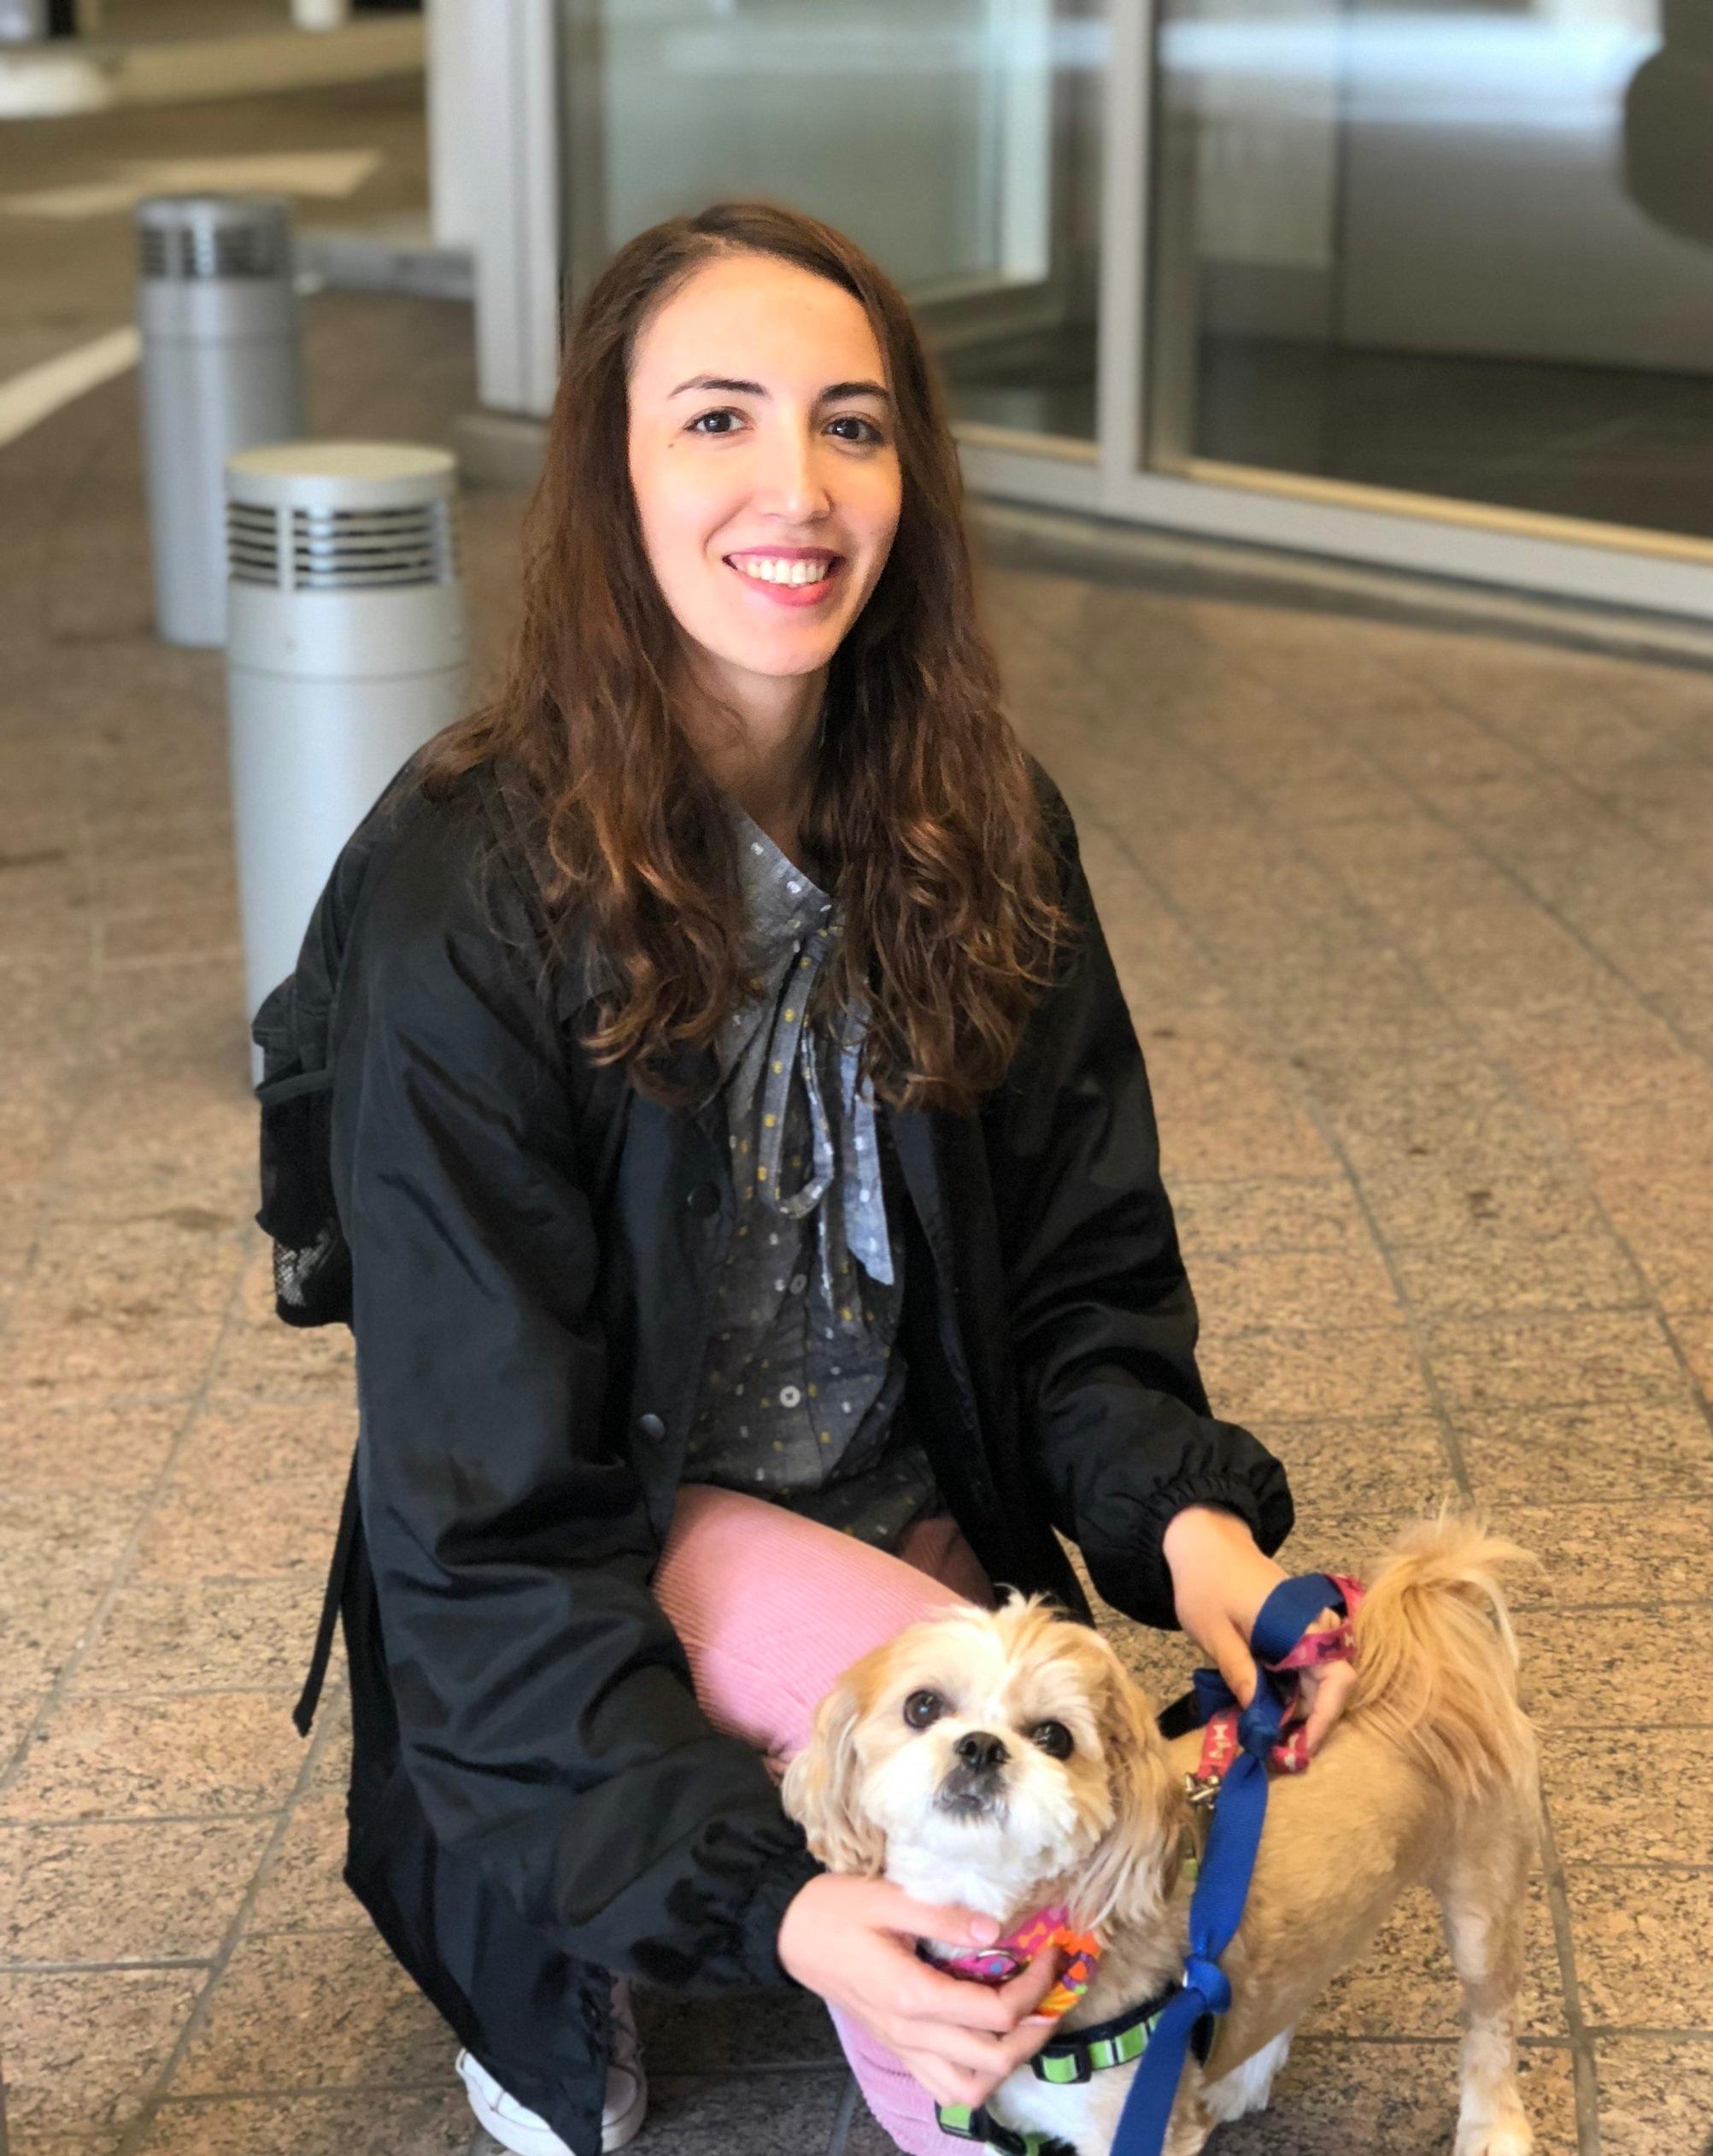 Alexa - Pack Leader - Walker and Pet Sitter